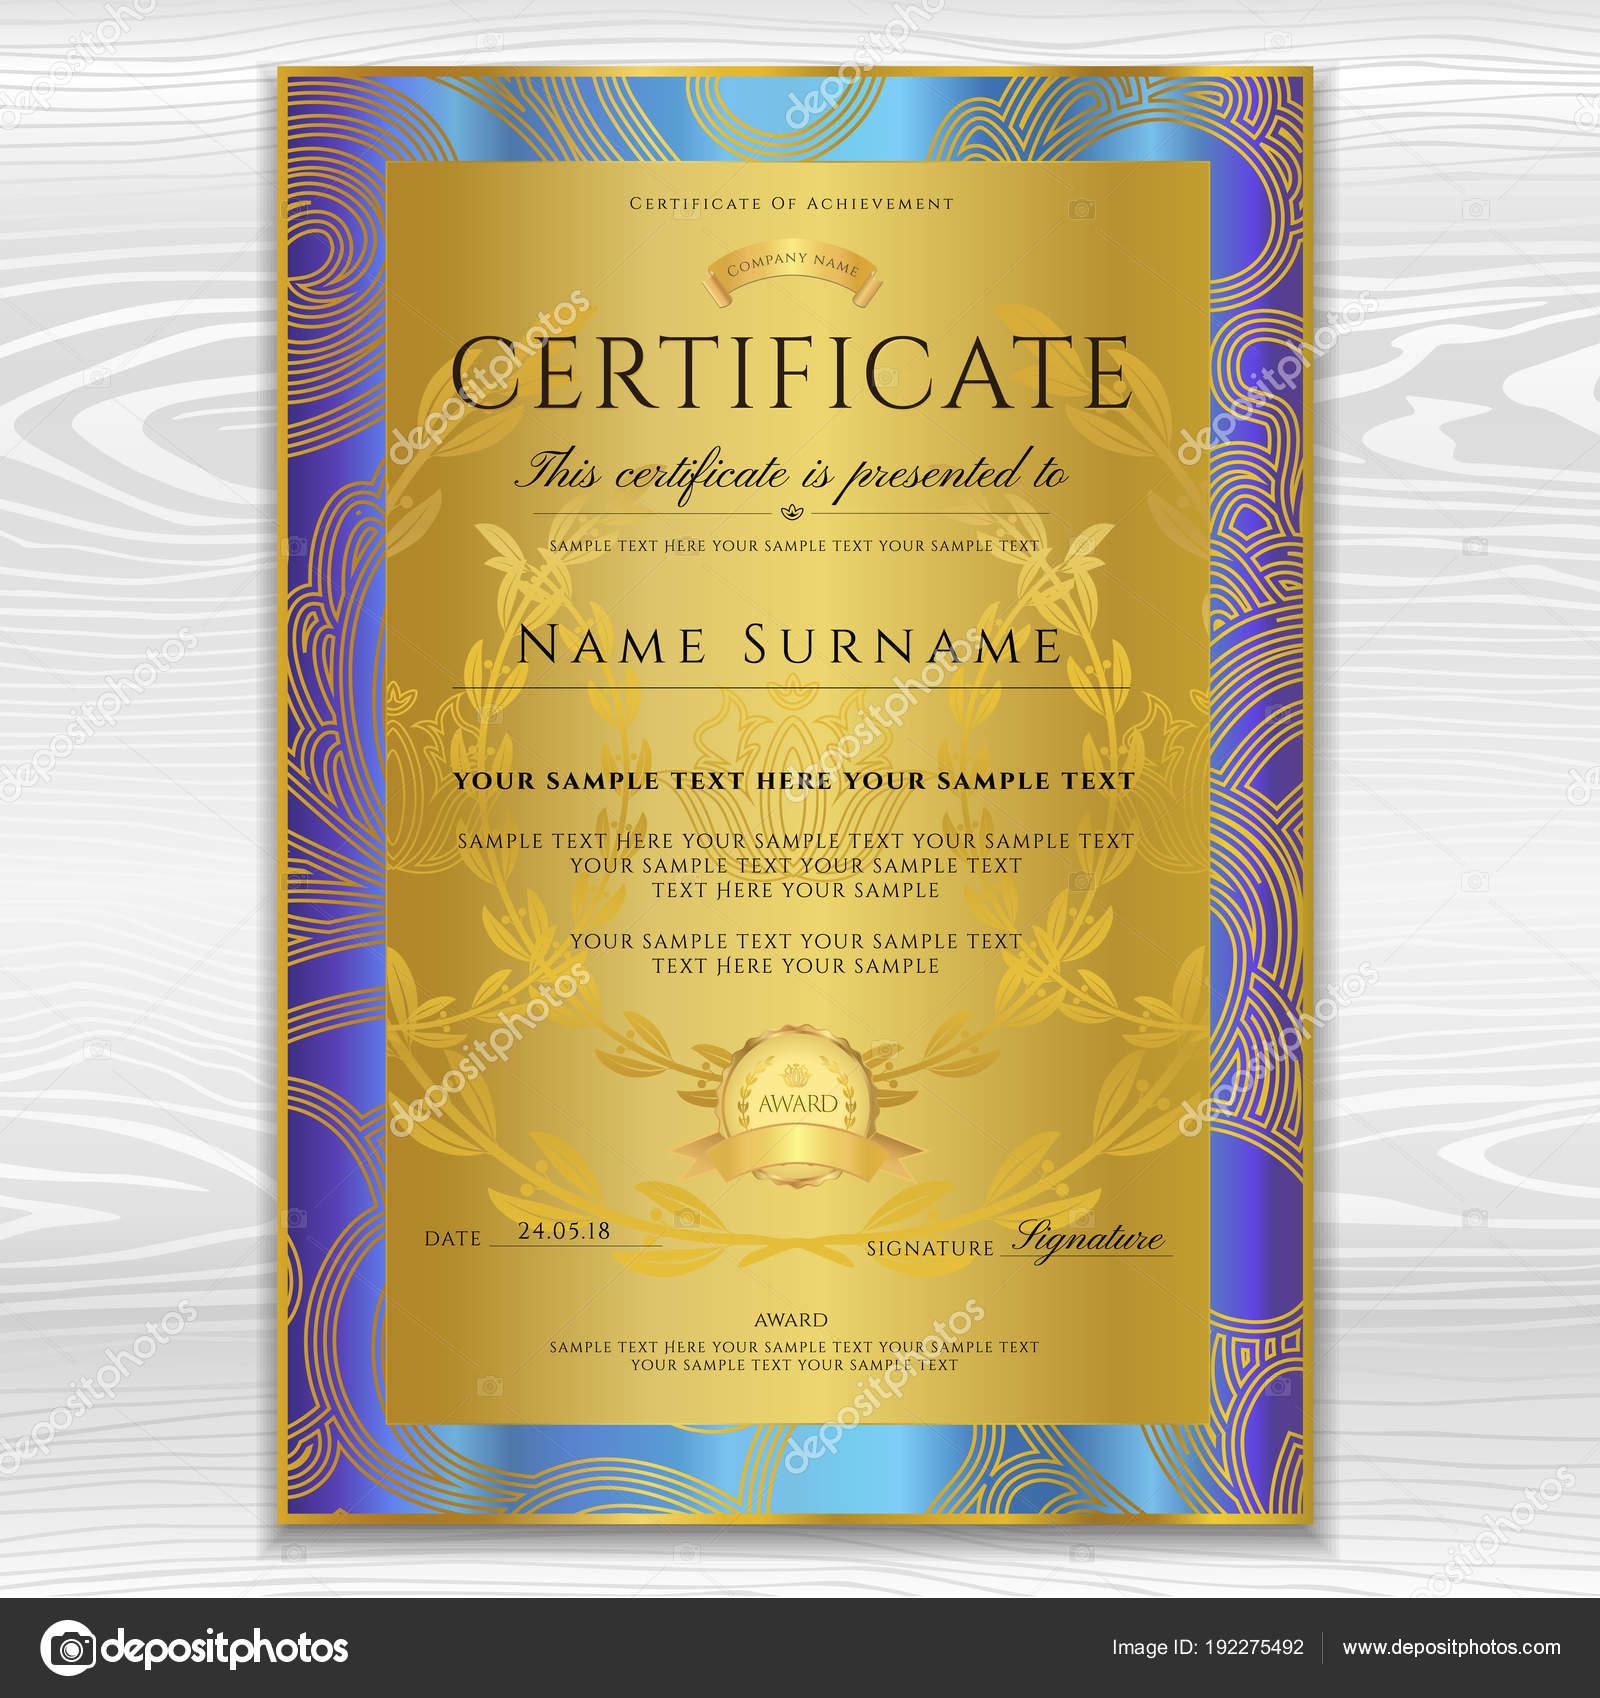 Certificate Diploma Golden Design Template Background Floral